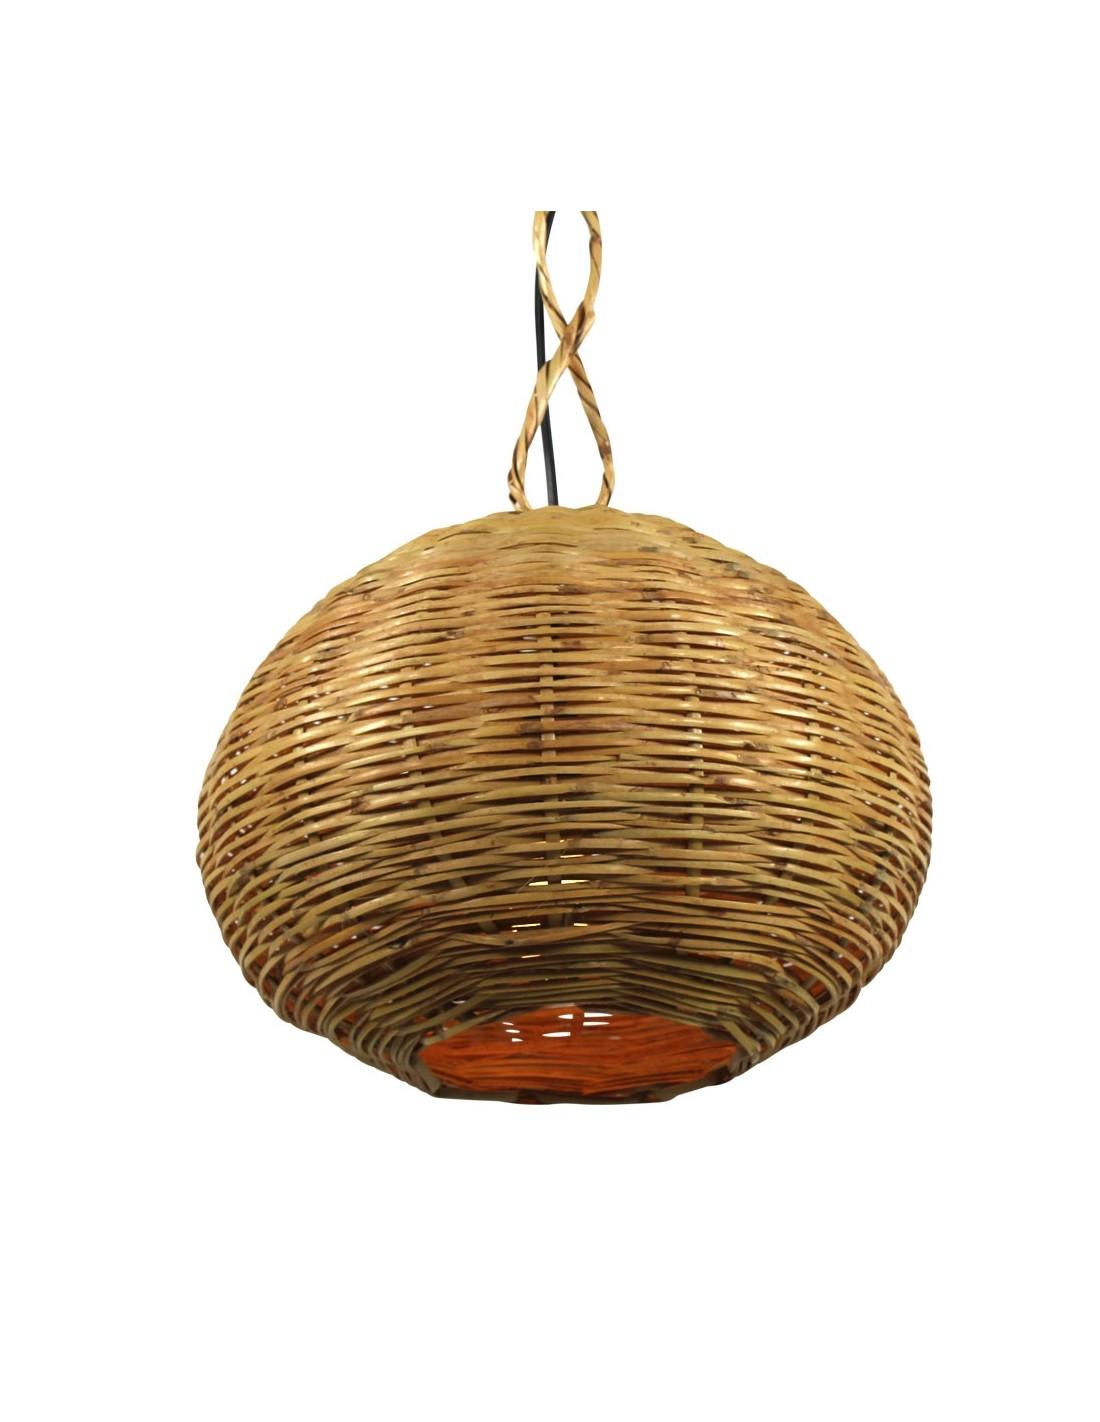 k rbe lampenschirme aus rattan albena marokko galerie albena shop. Black Bedroom Furniture Sets. Home Design Ideas